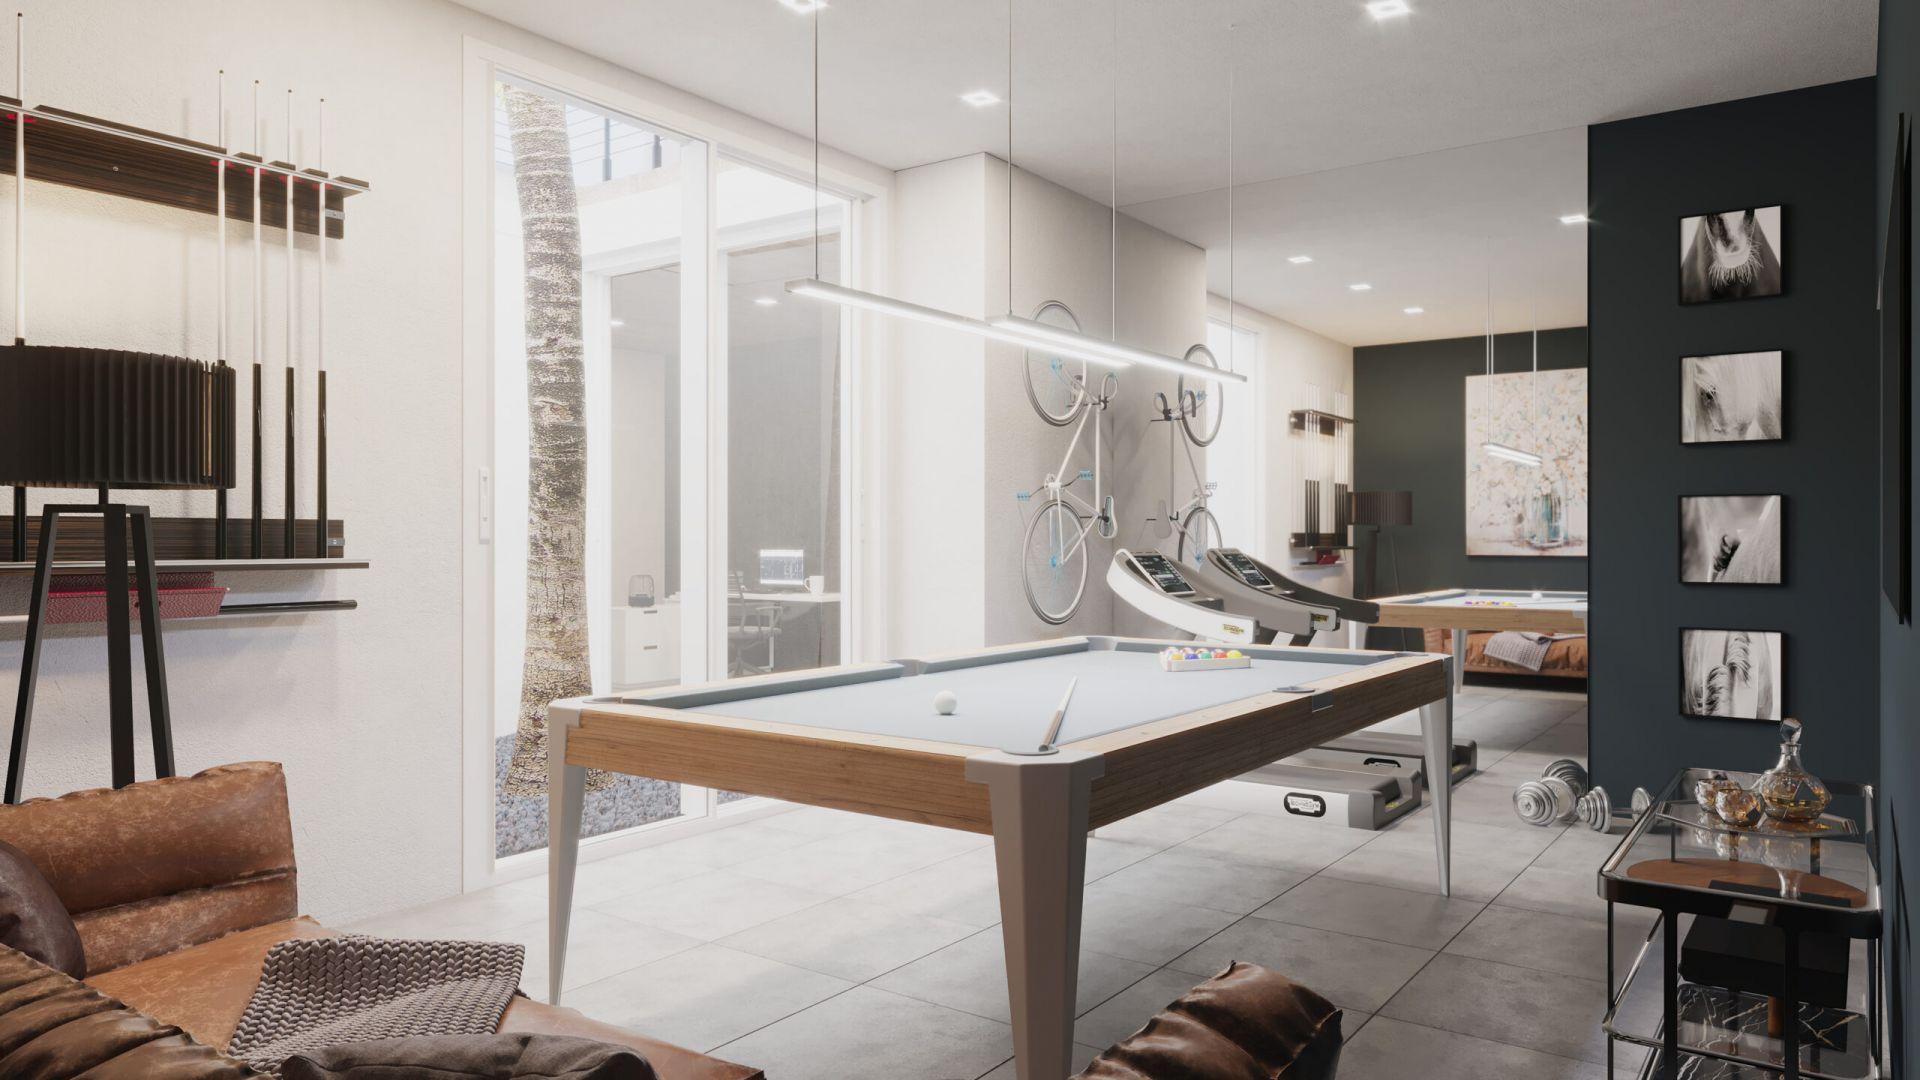 Serenity Luxury Villas Tenerife - img 10.